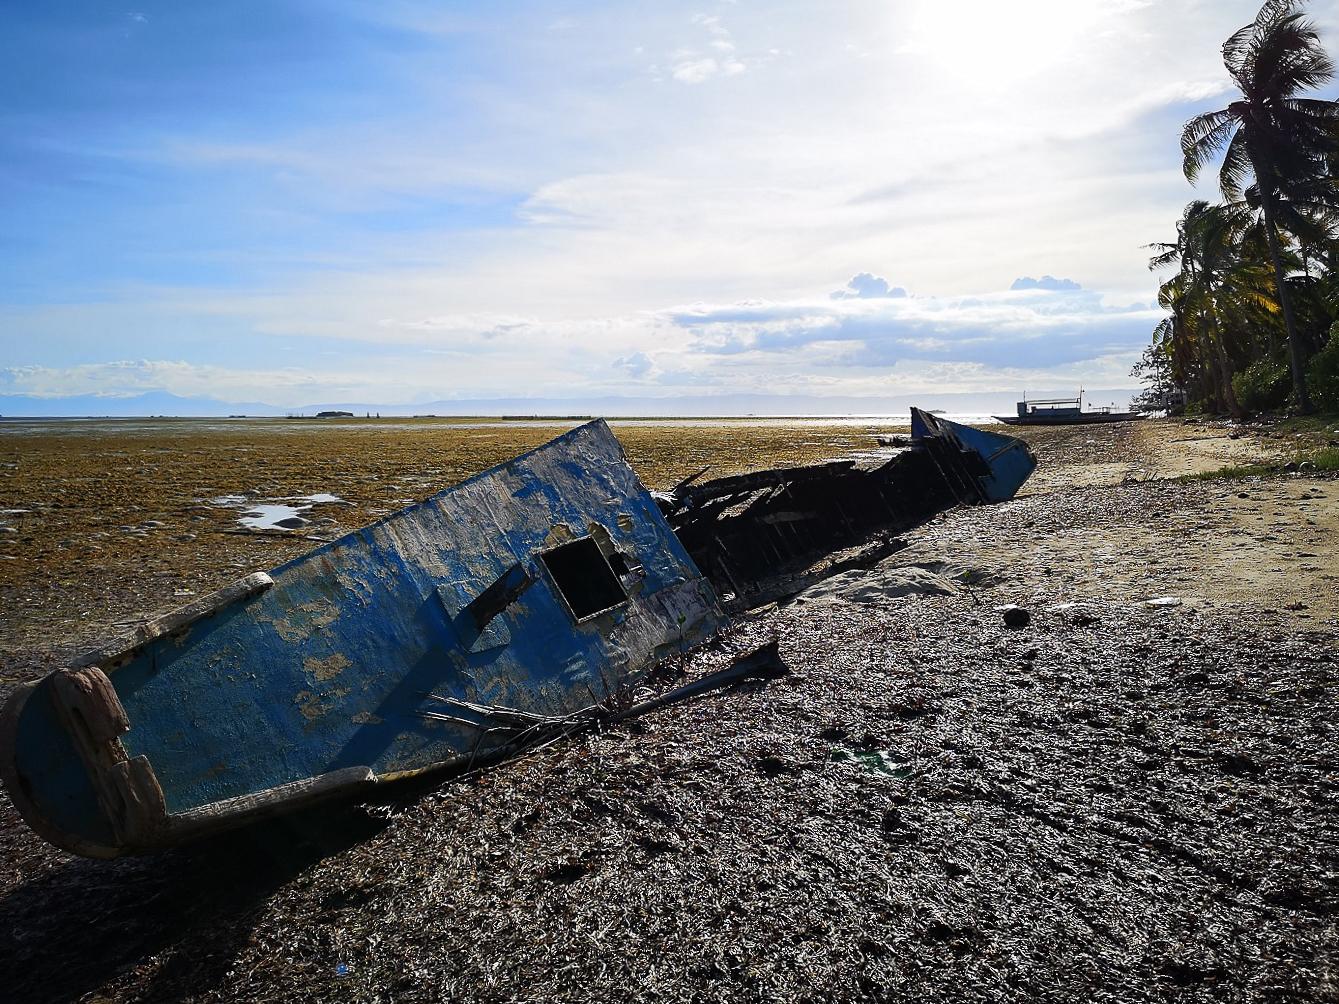 Carcasse de bateau à Danao Beach Panglao